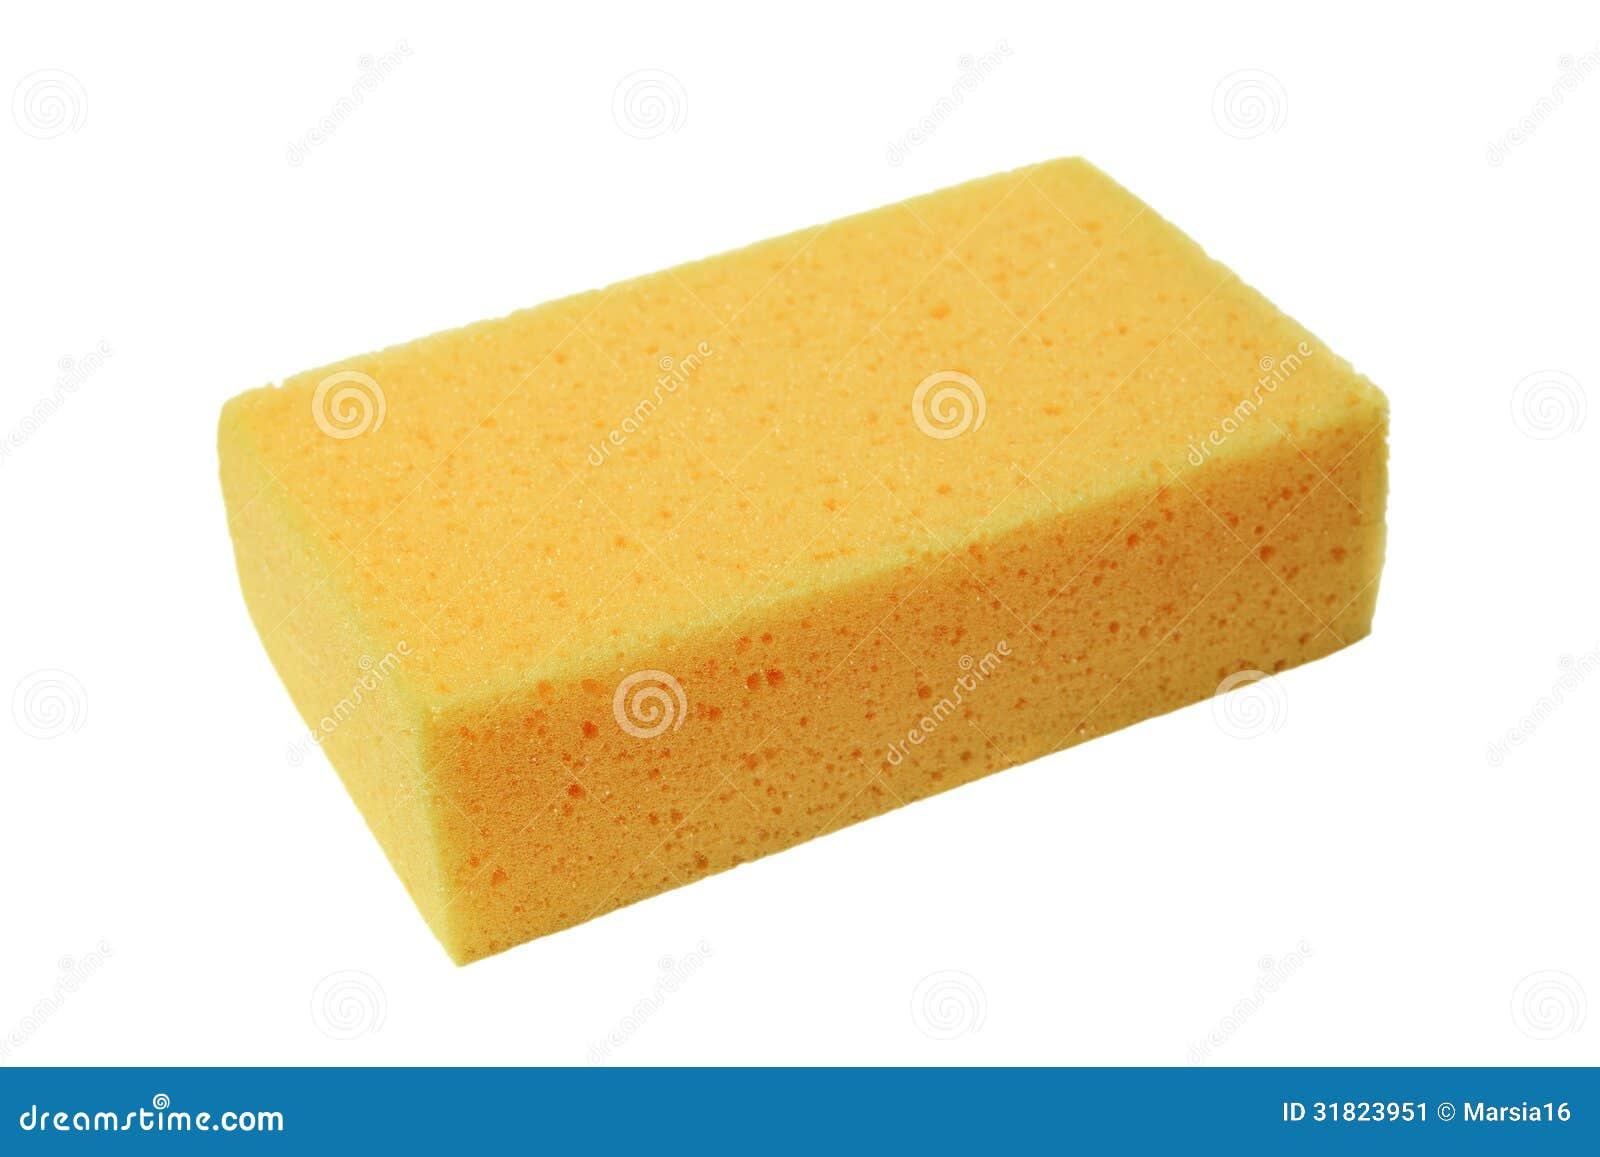 Żółta gąbka na bielu